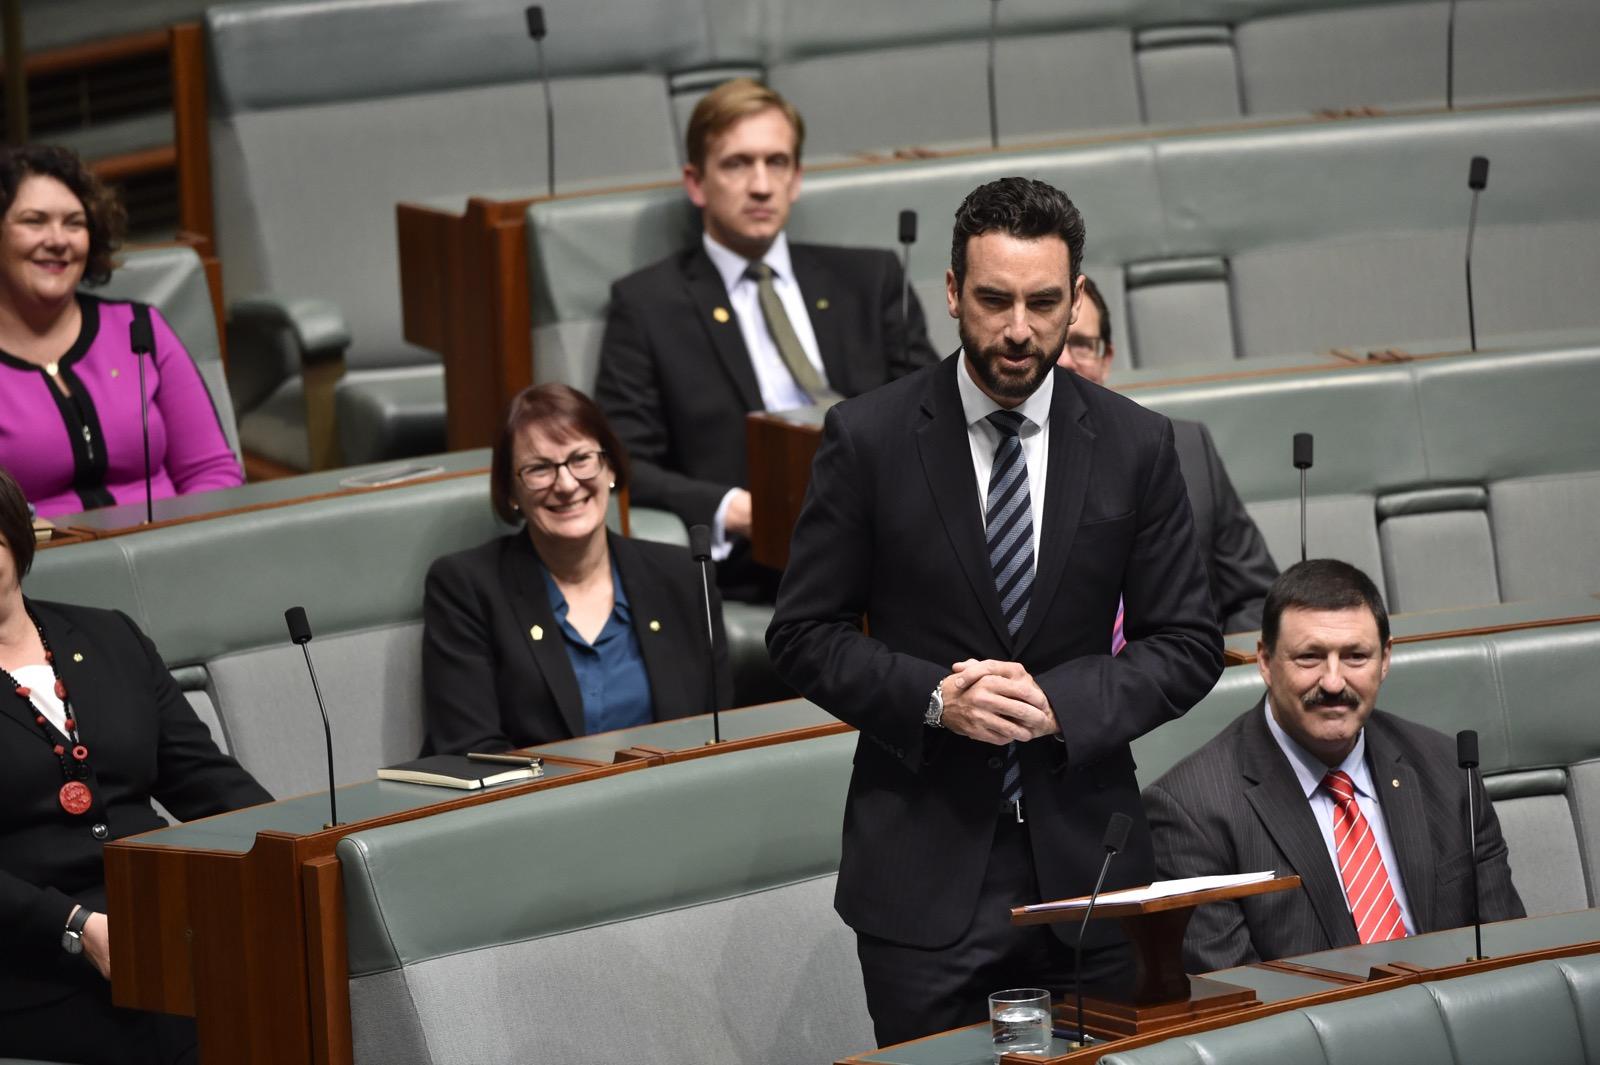 Perth MHR Tim Hammond giving his maiden Parliamentary speech.